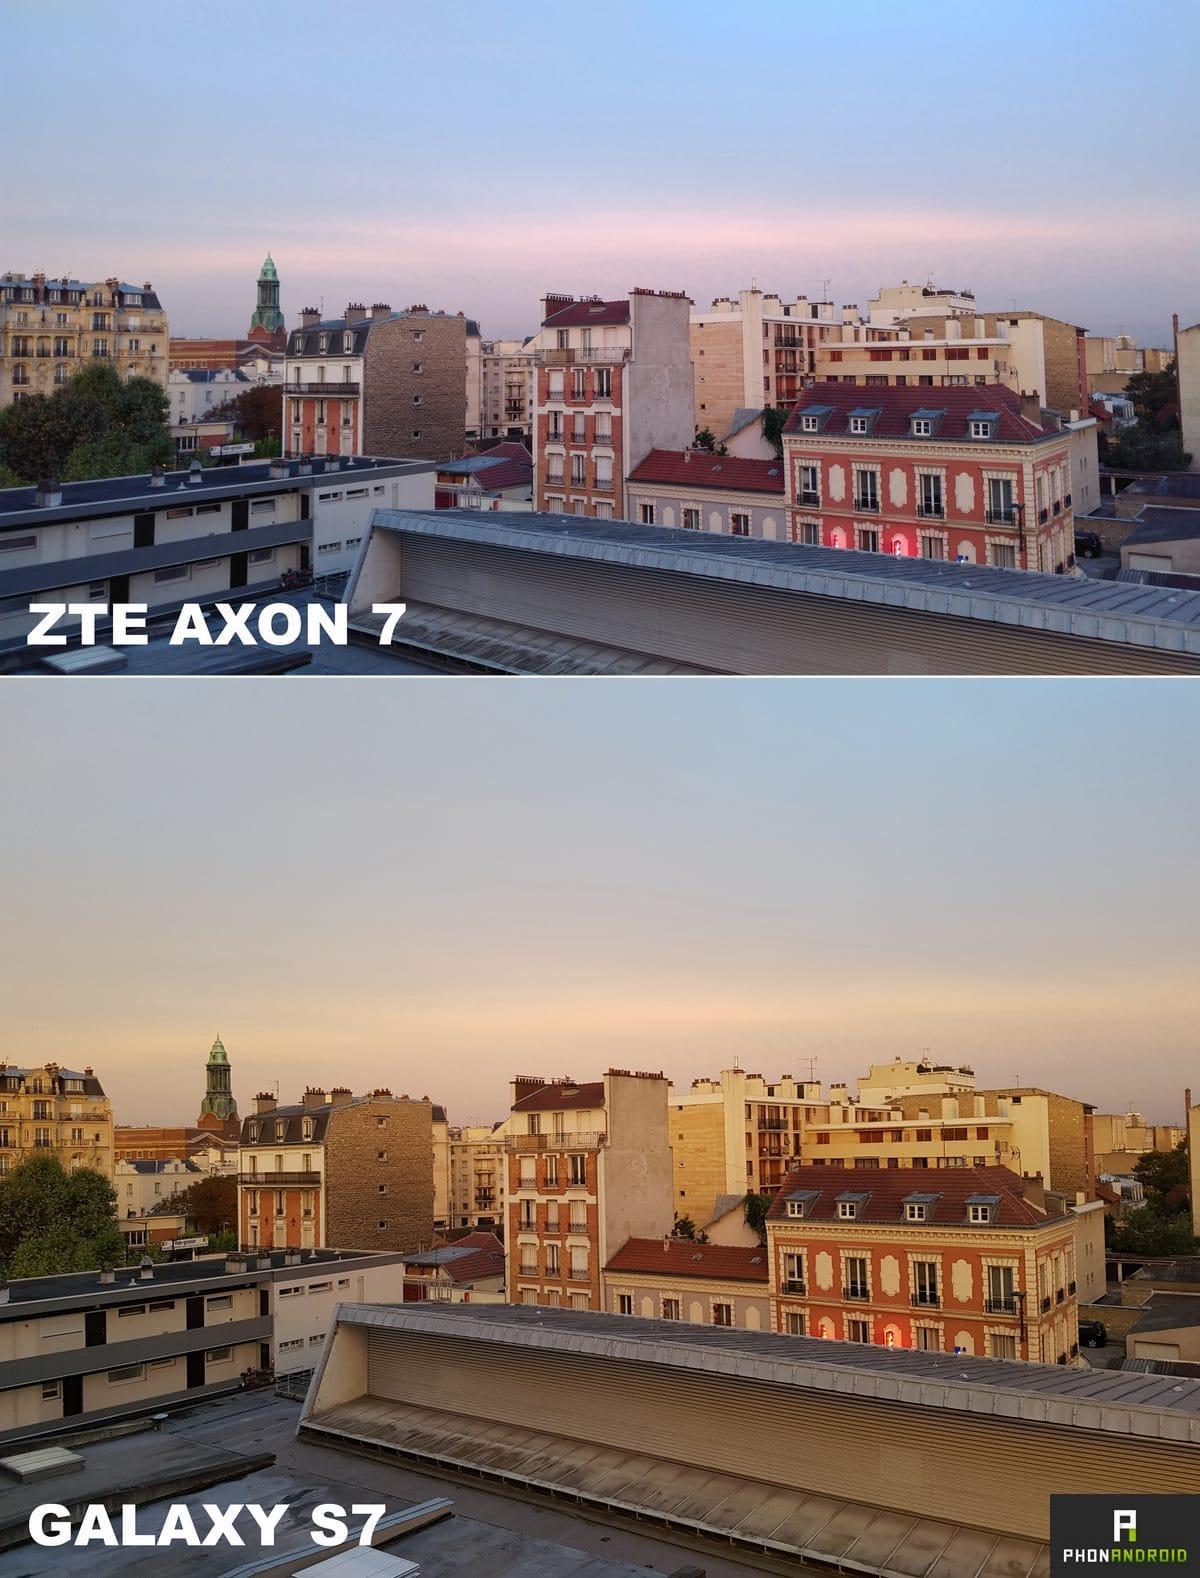 zte axon 7 photo soir